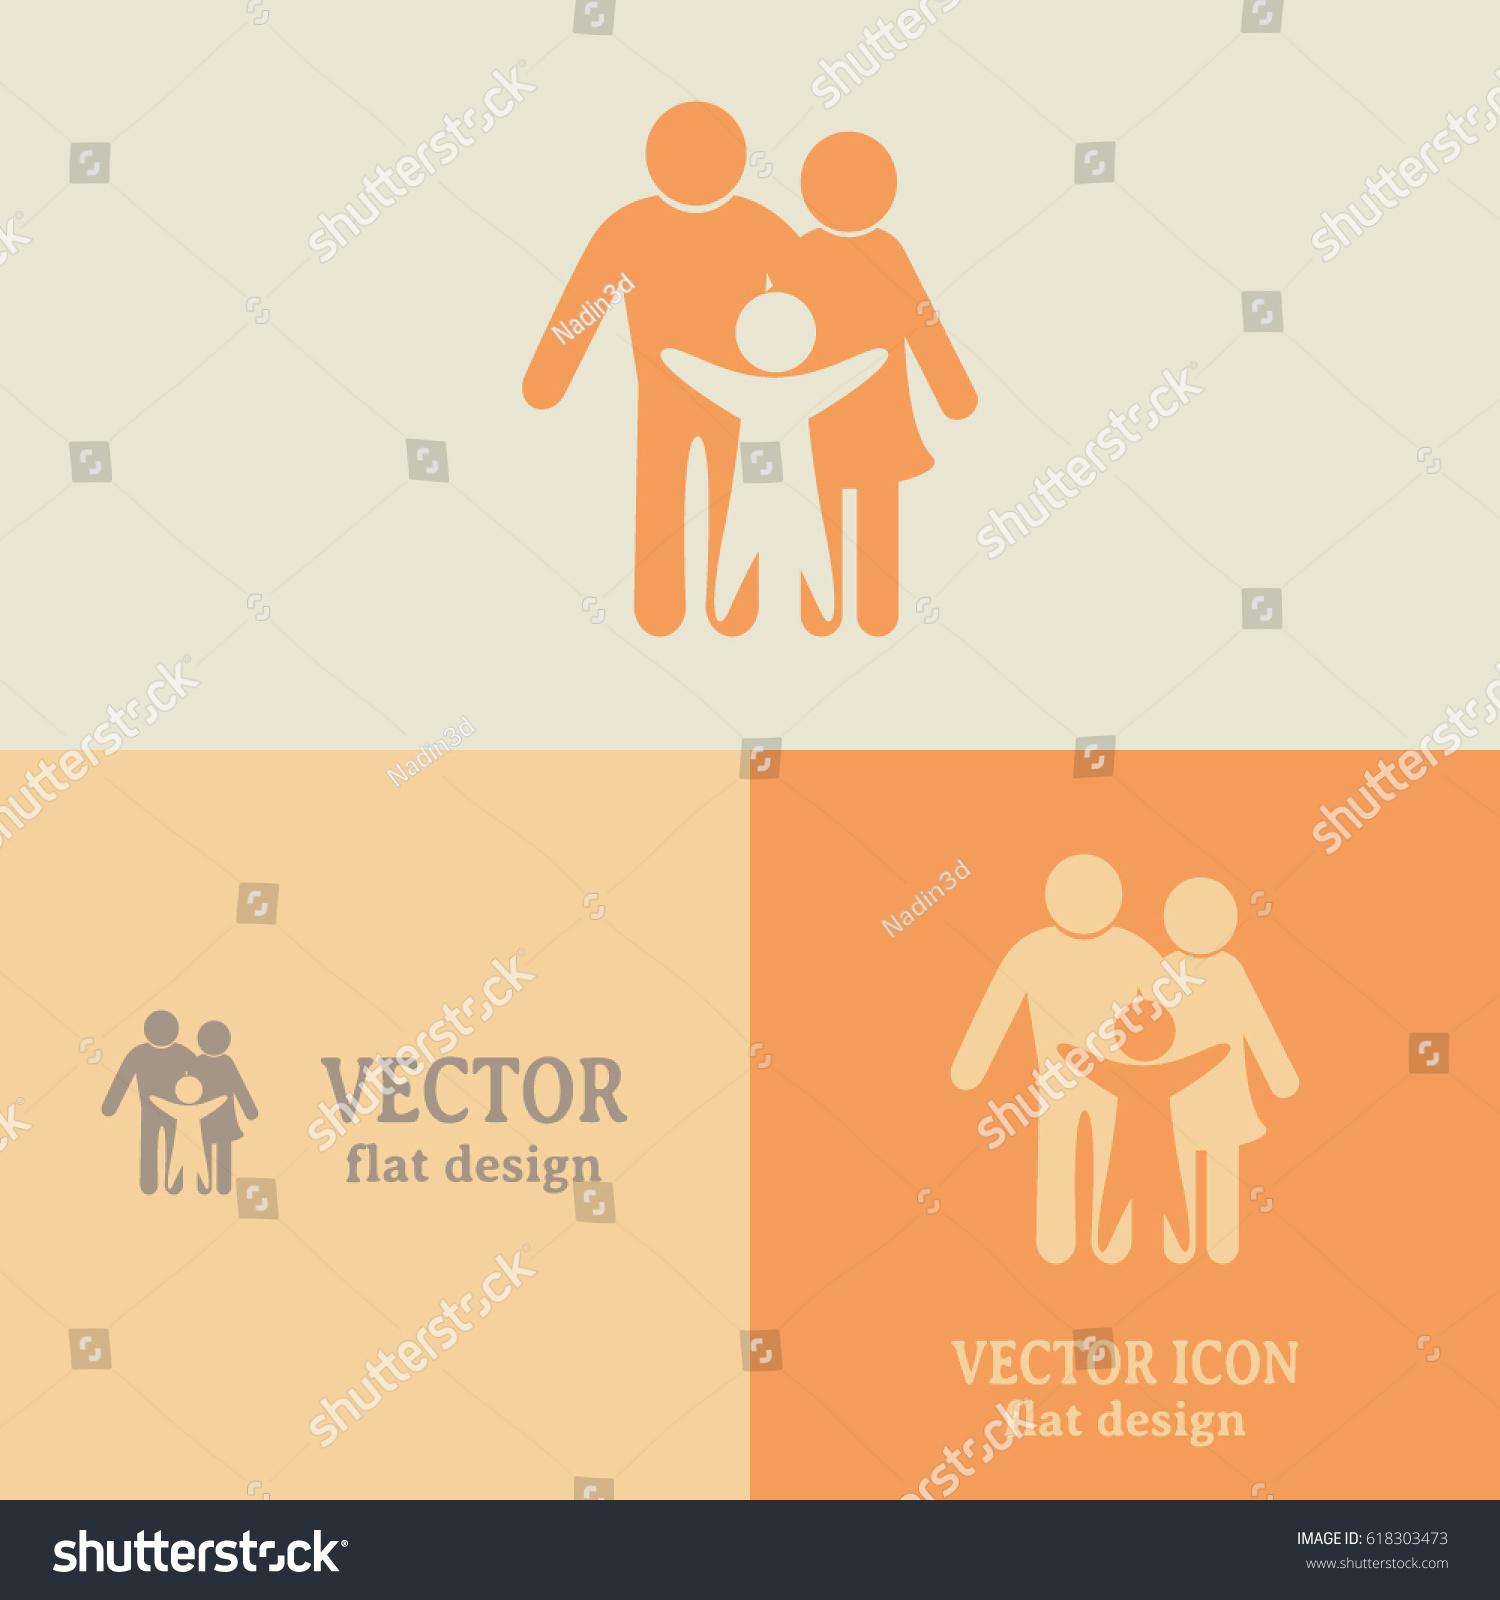 Business cards design happy family icon stock vector 618303473 business cards design happy family icon stock vector 618303473 shutterstock colourmoves